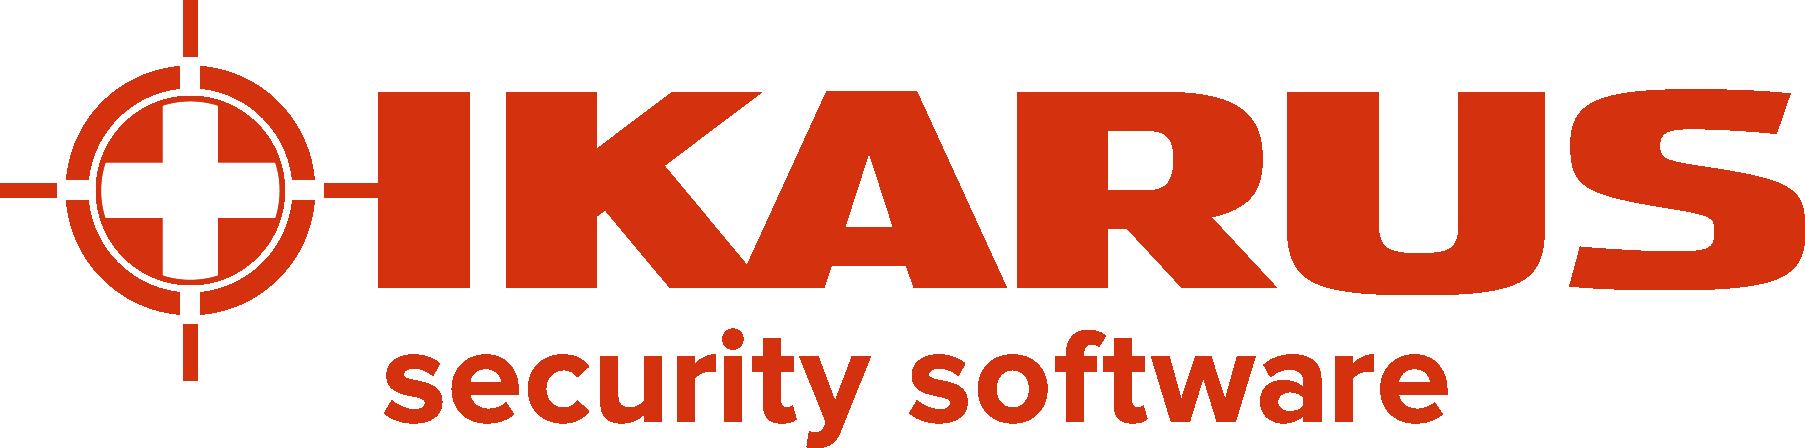 confare partner logo